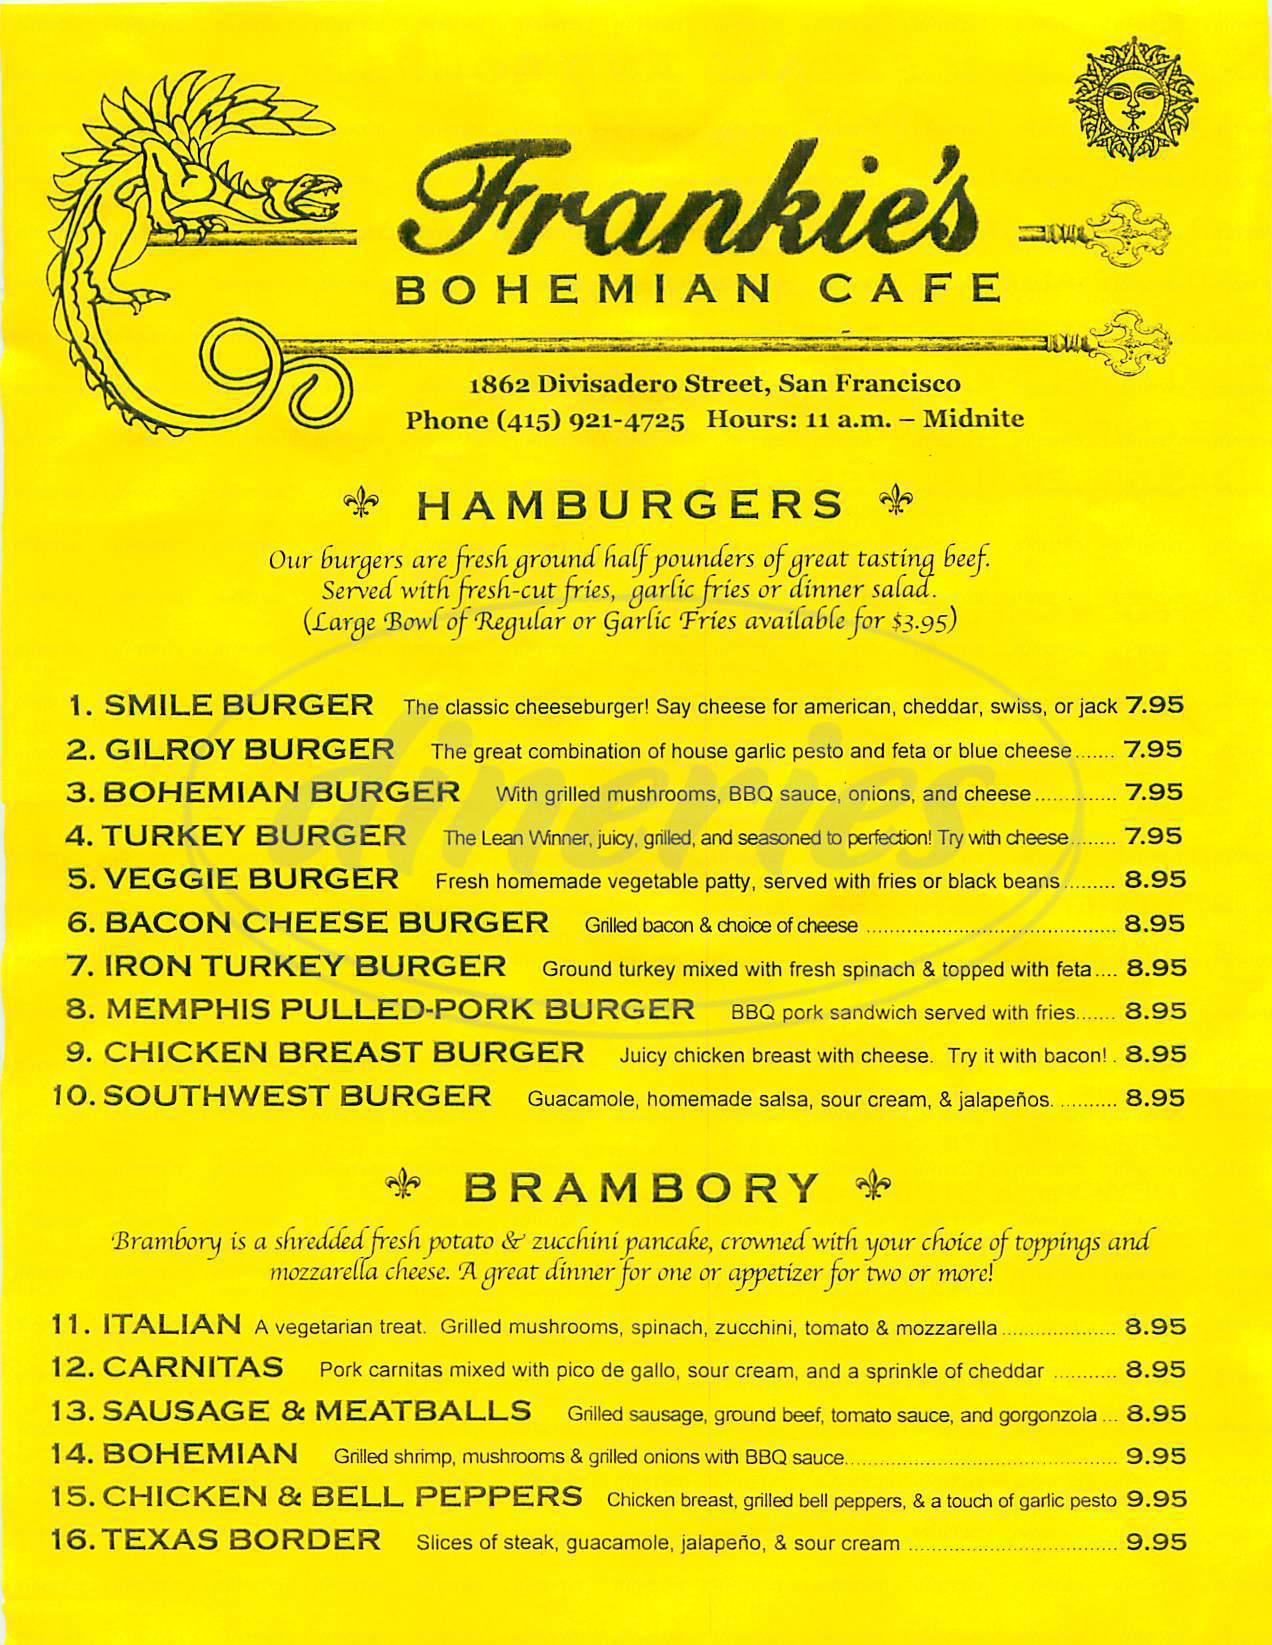 menu for Frankie's Bohemian Café